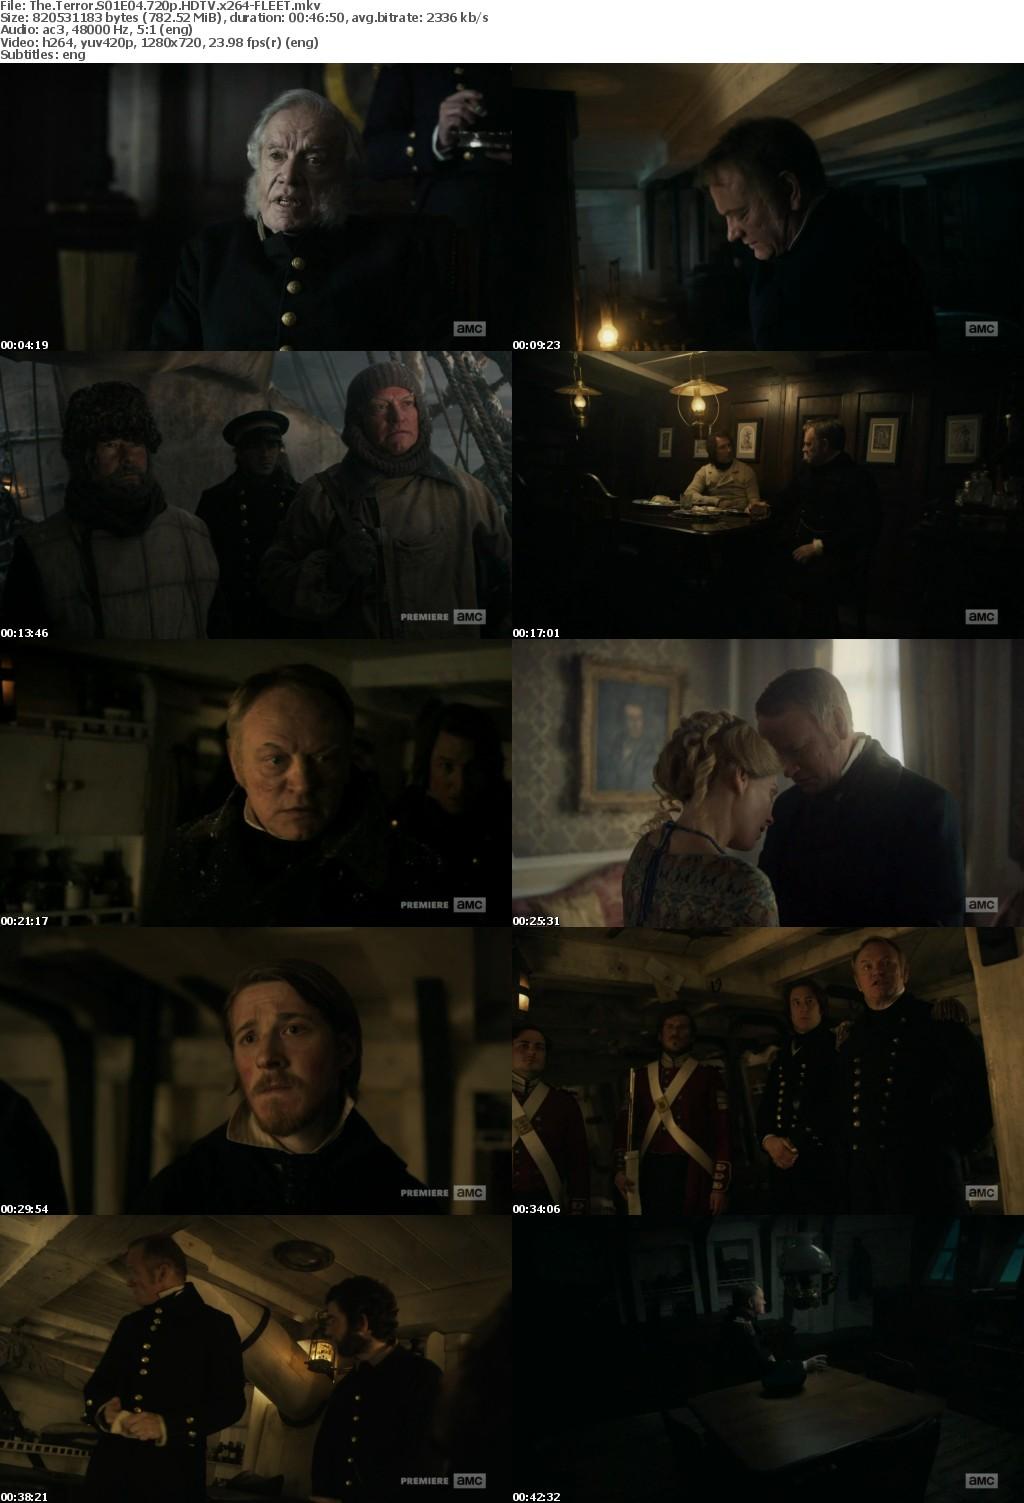 The Terror S01E04 720p HDTV x264-FLEET